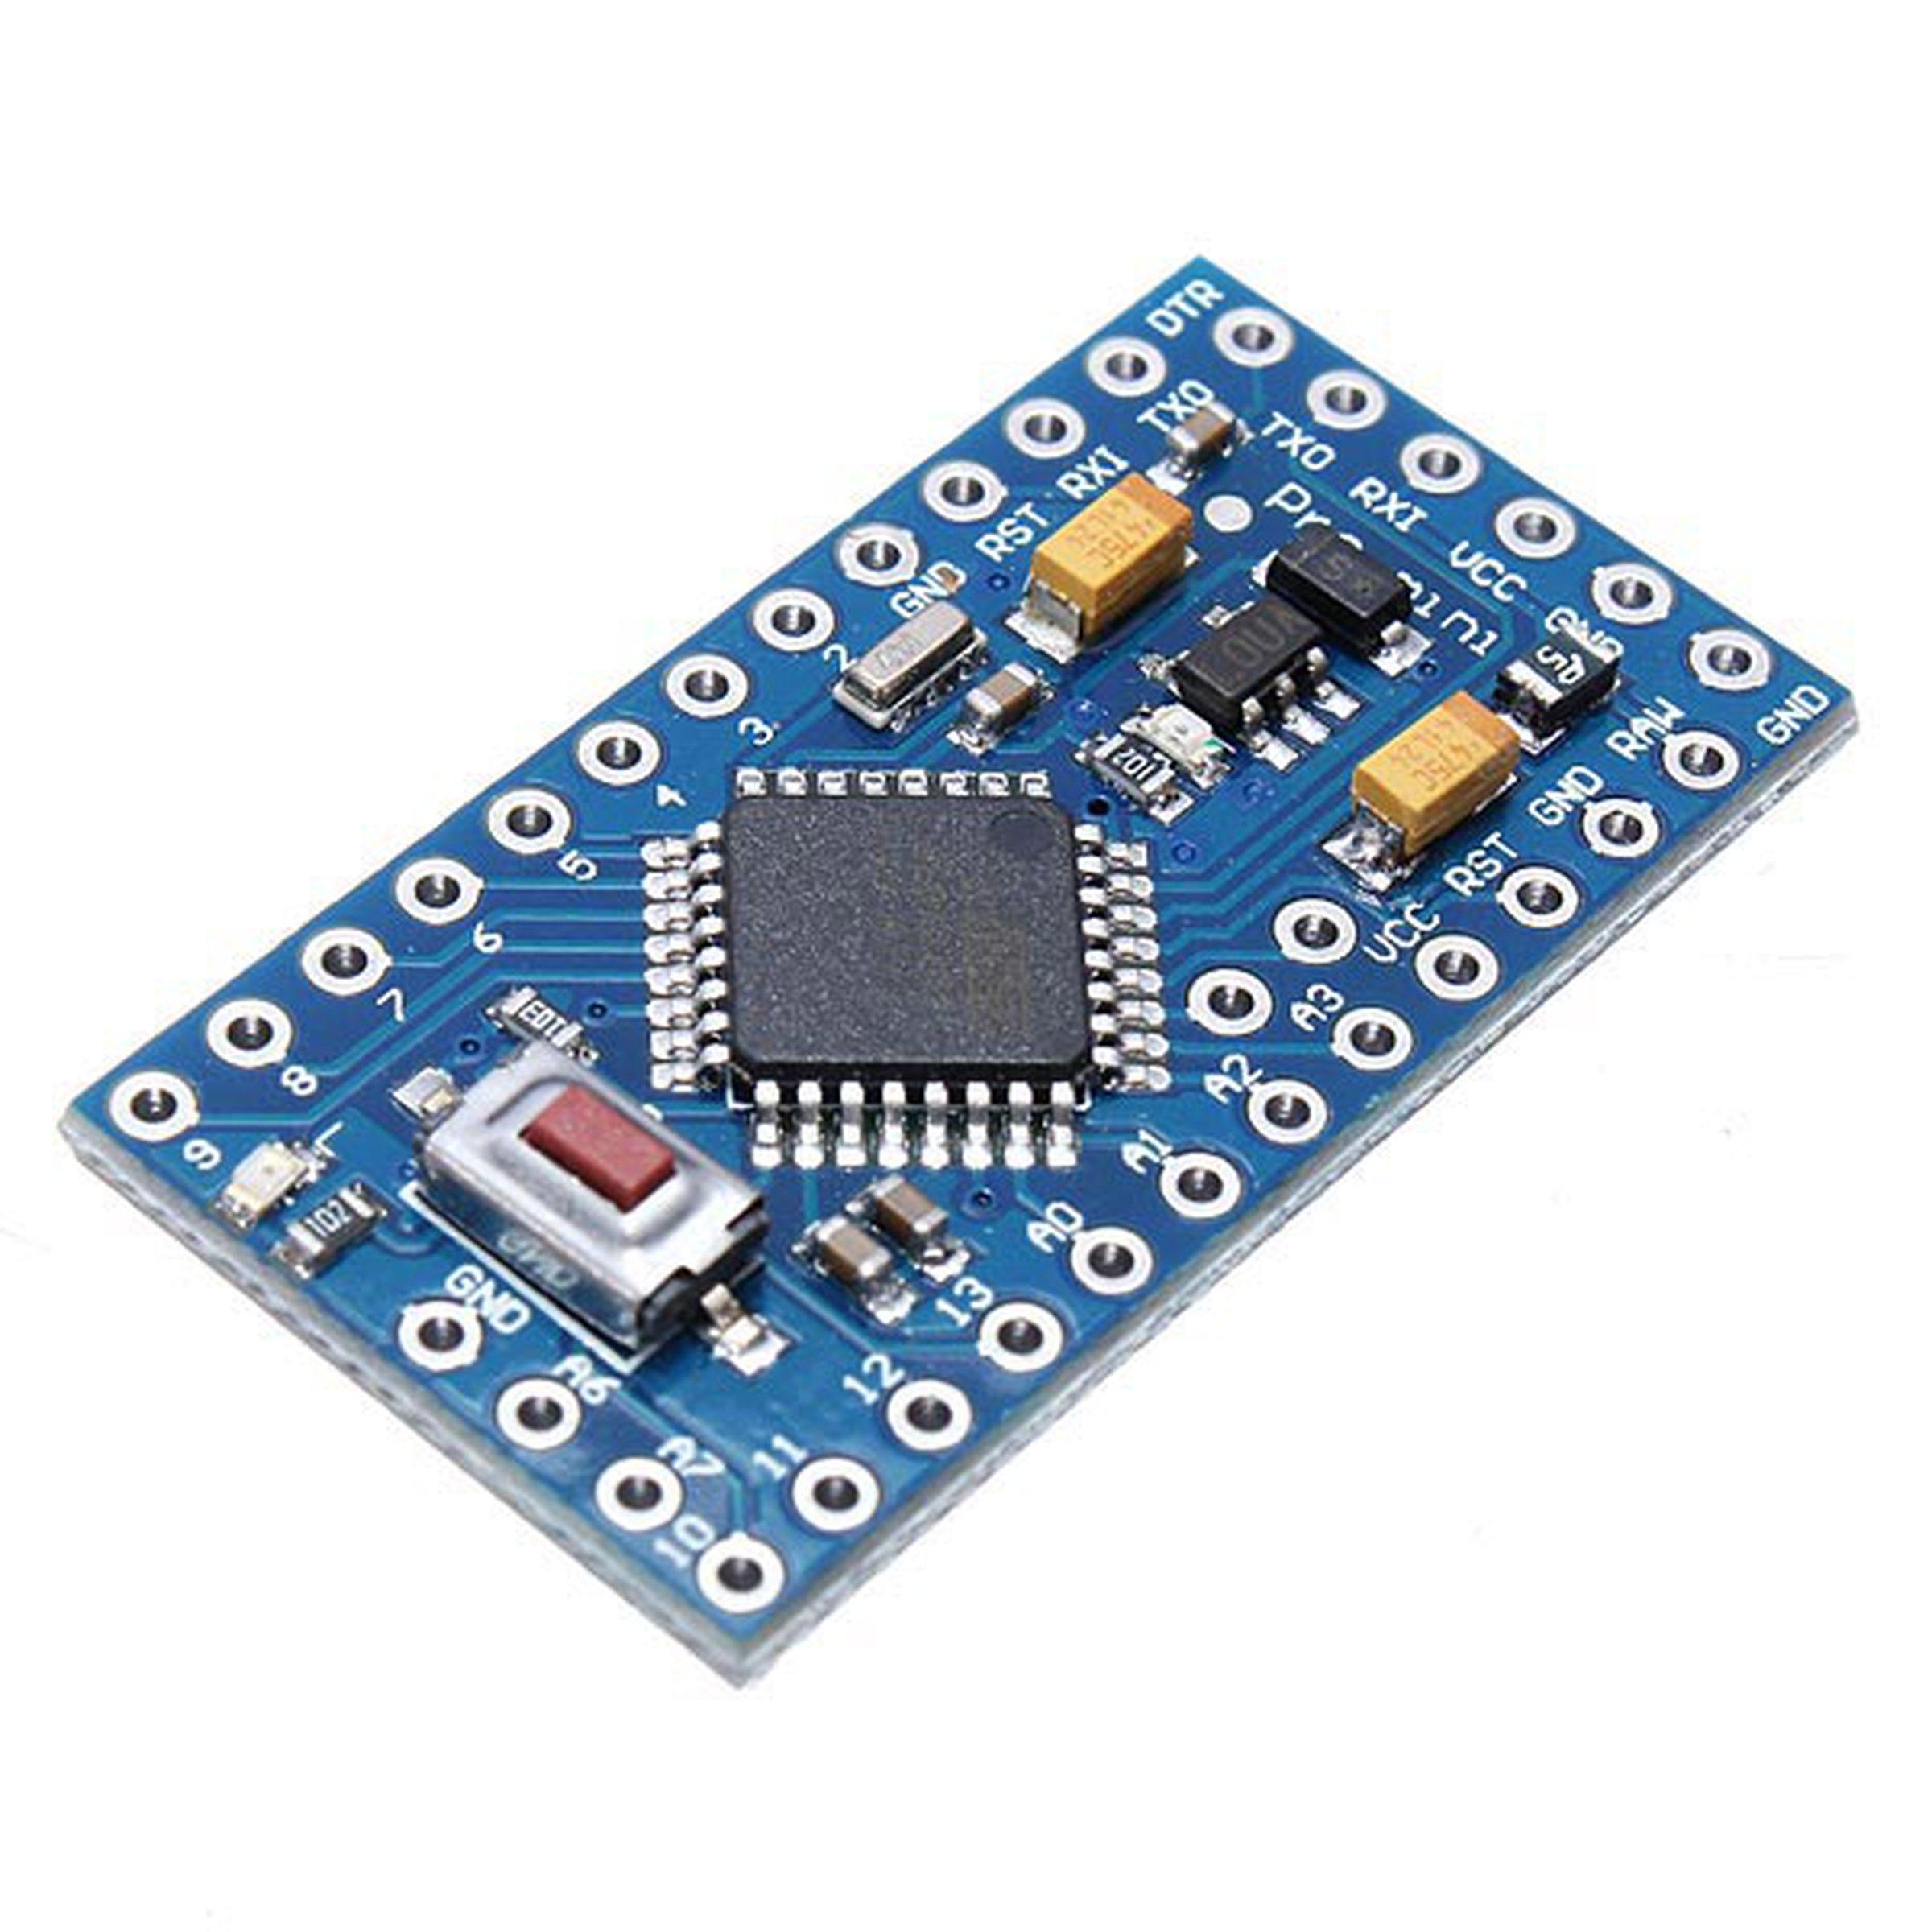 Arduino compatible pro mini module board from universbuy